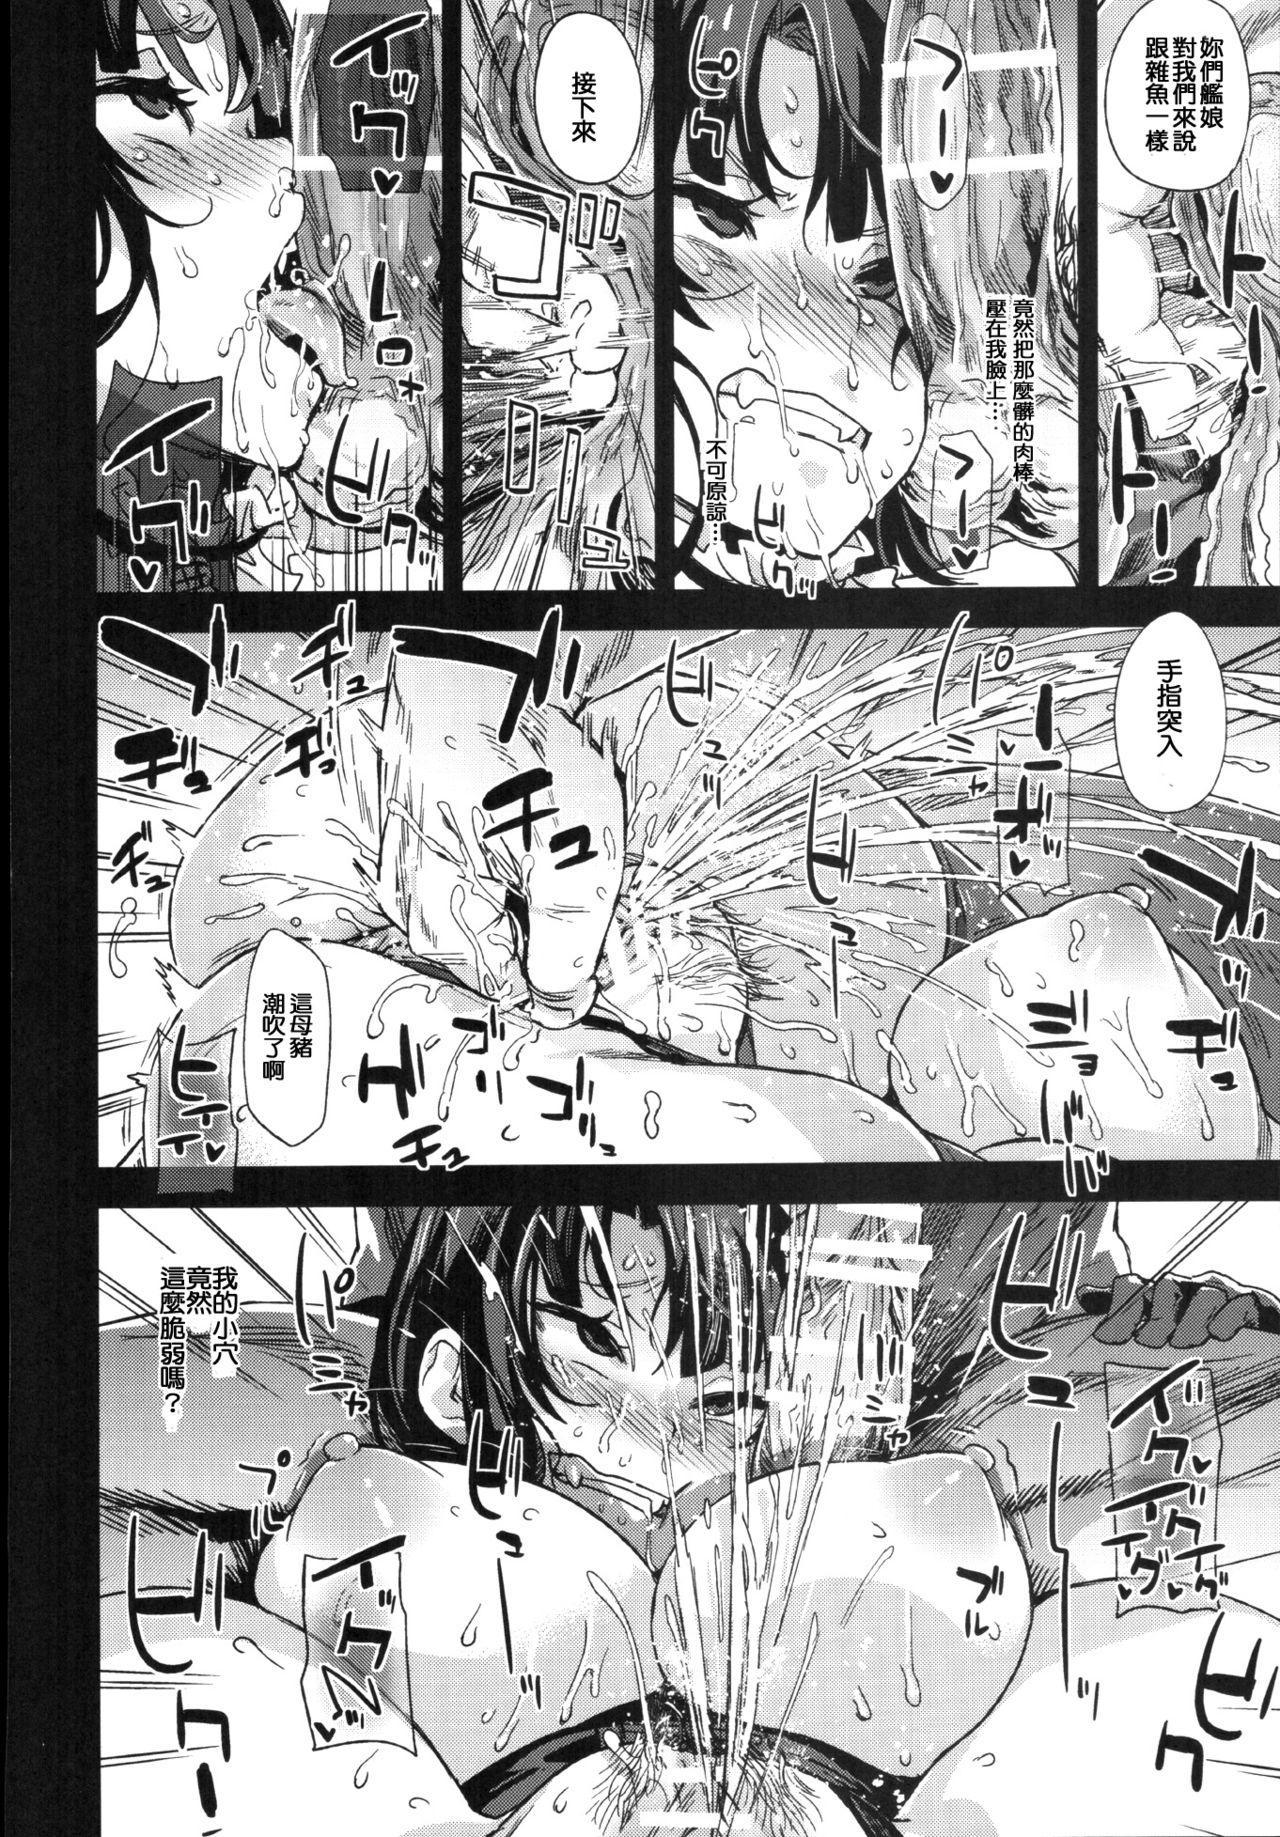 Victim Girls 22 Joou Kashima no Choukyou Nisshi 22